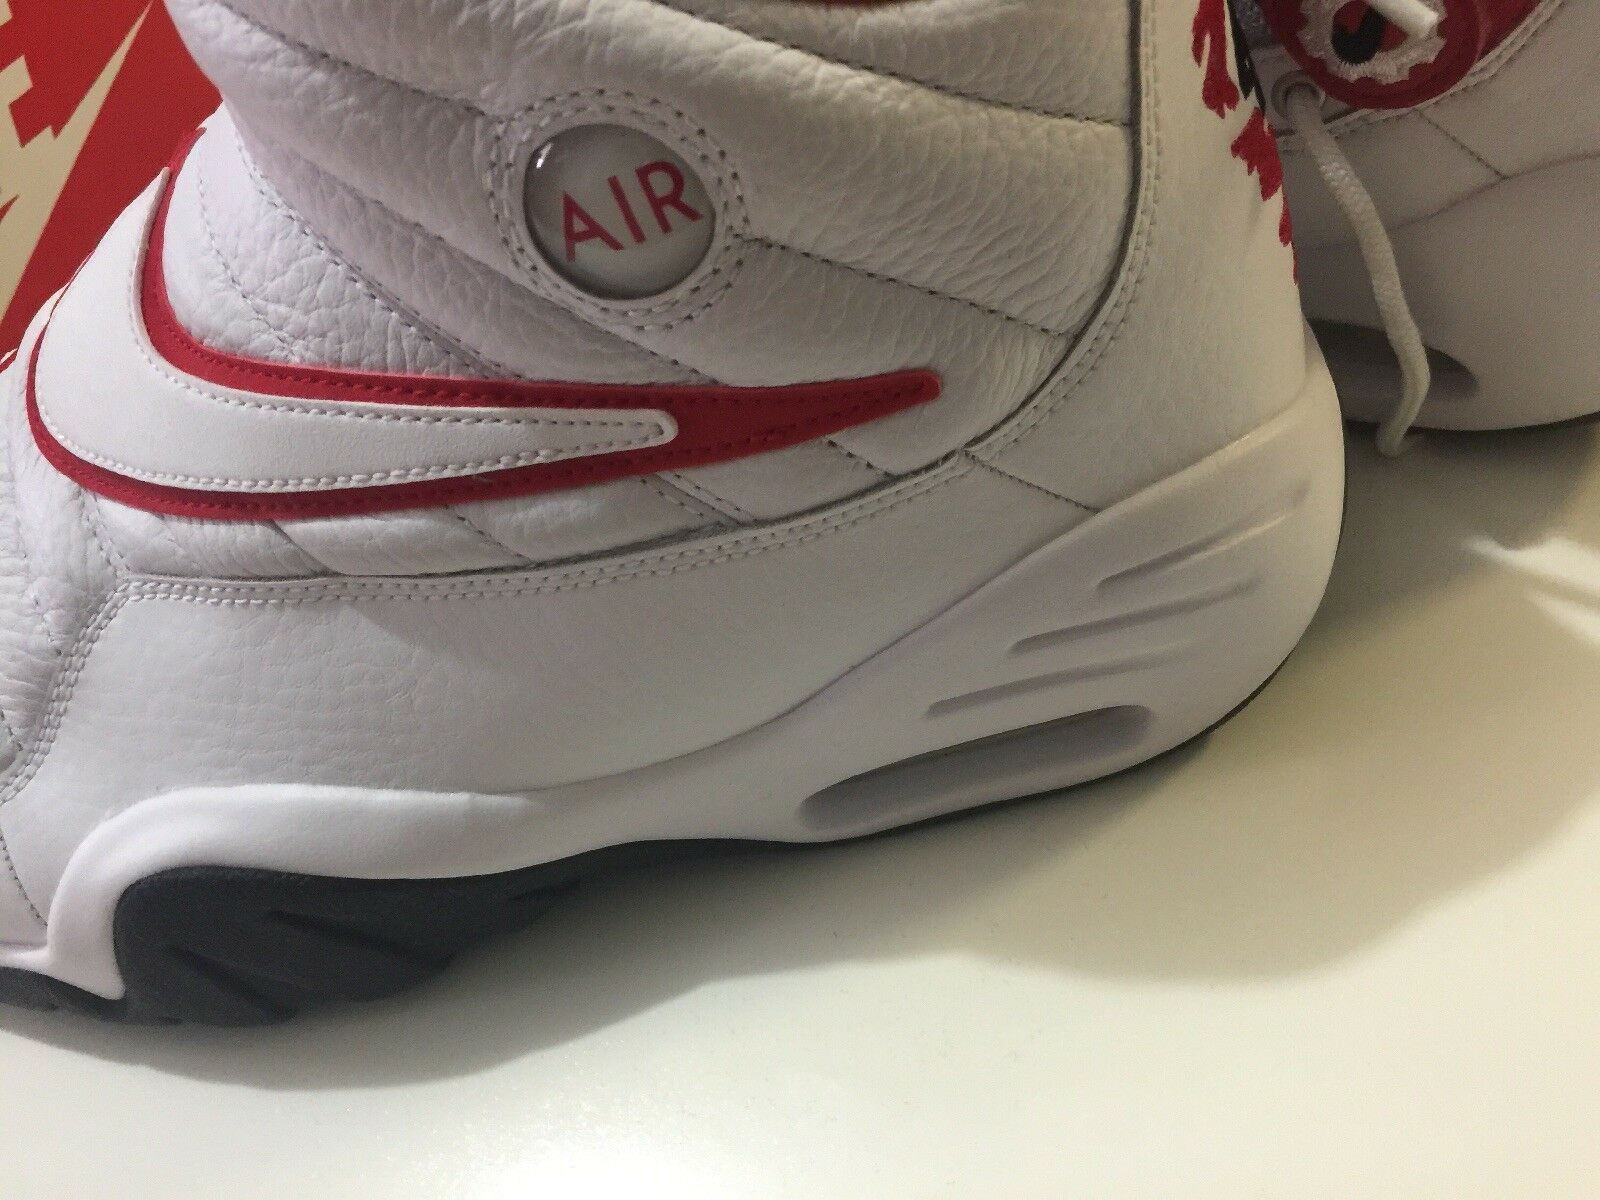 Nike Air Shake Ndestrukt Men's Basketball Shoes White/Red 880869 100 Size 11 image 9